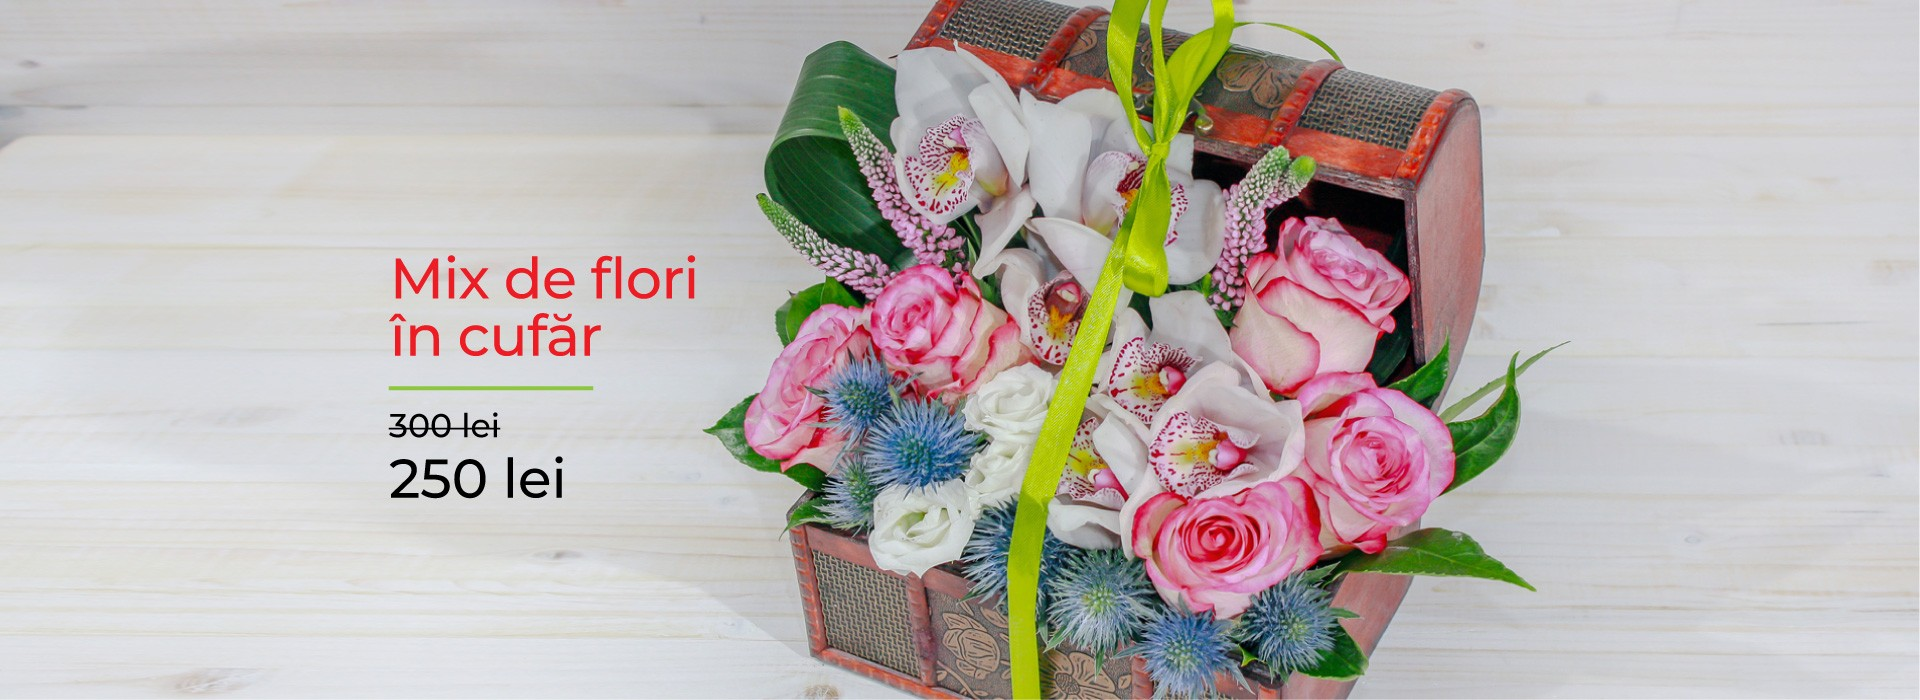 Florarie Online Ploiesti Cu Livrare La Domiciliu Floraria Siatiro